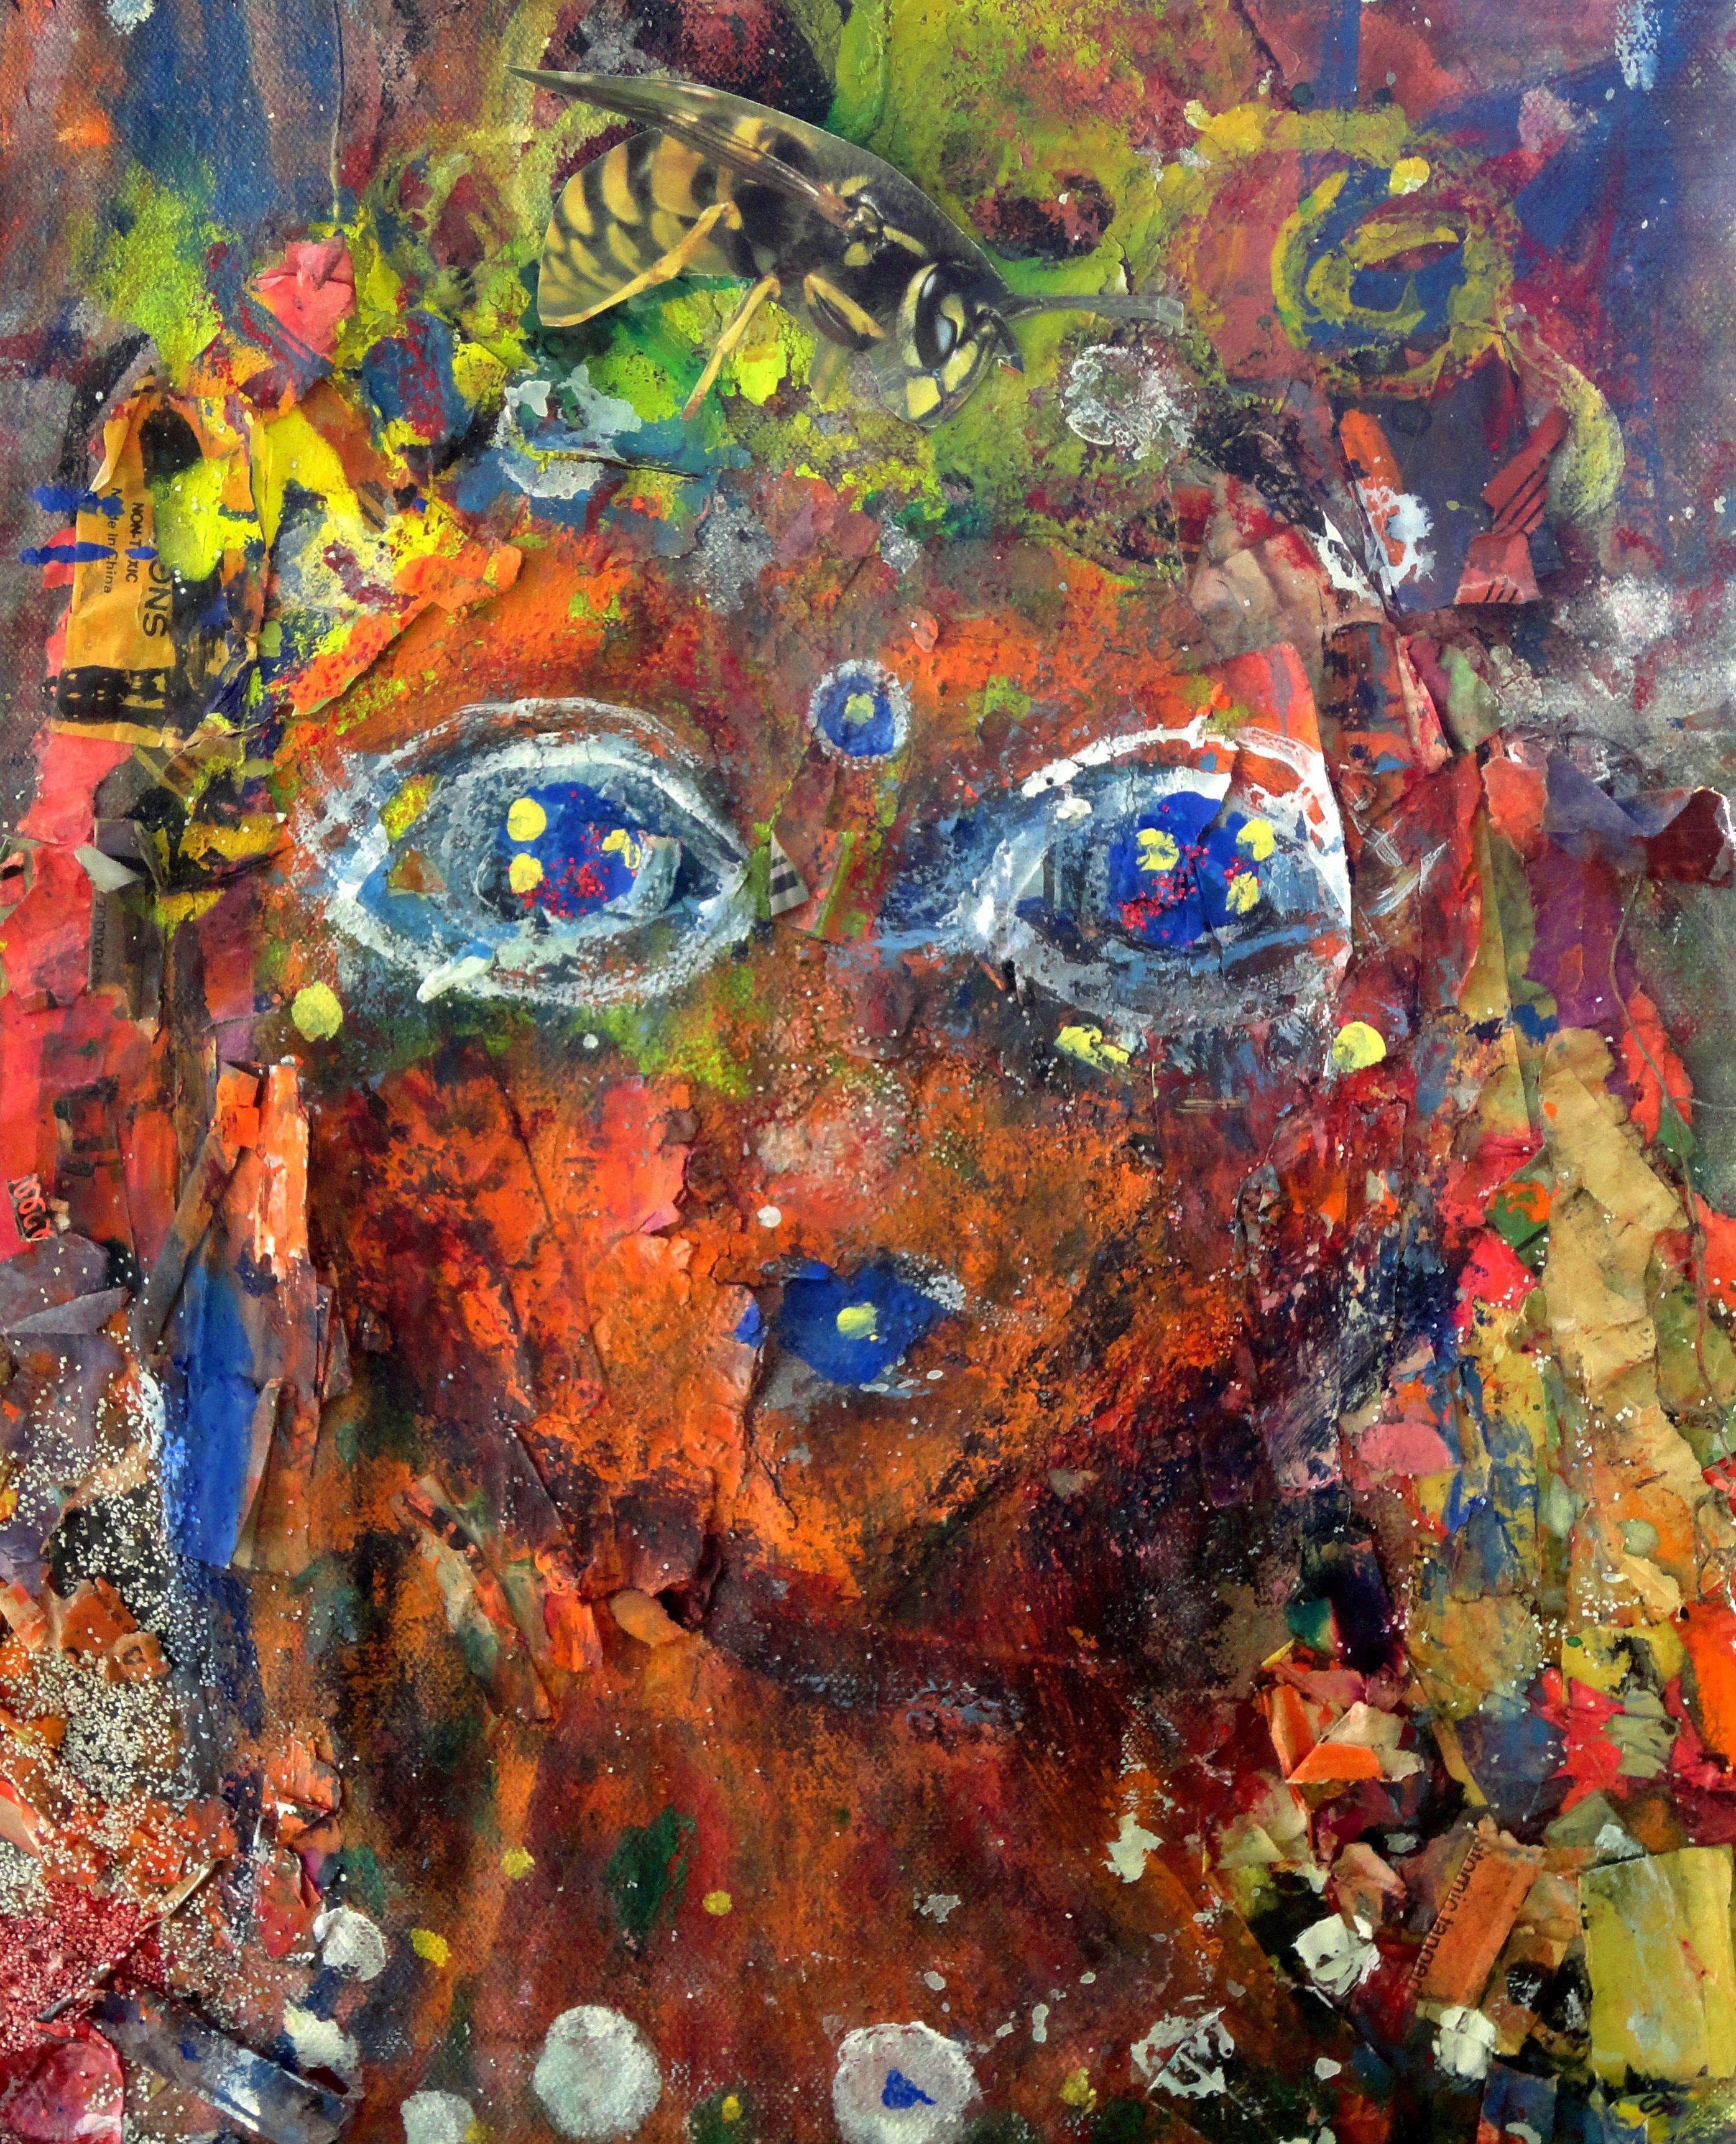 original art. by Juliana Lachance www.julianalachance.com  #recycled #art #painting #bee #queenbee #bees #avant garde